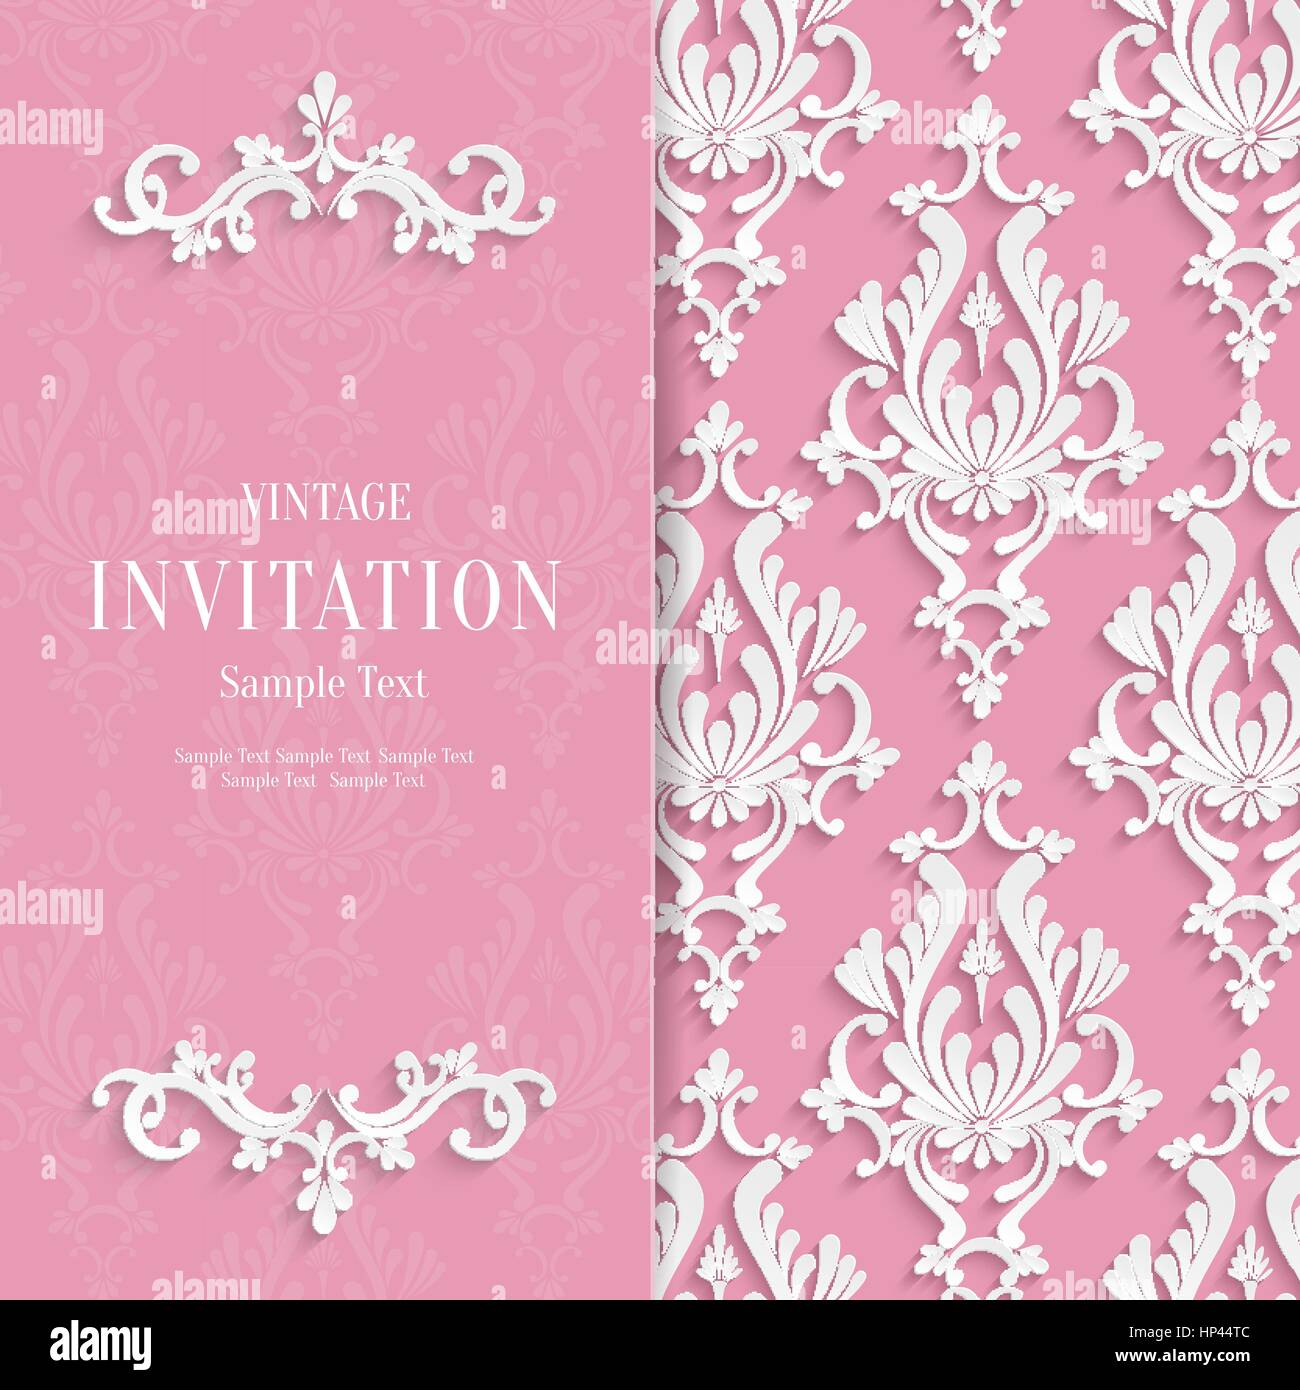 Vector pink floral 3d wedding invitation background template stock vector pink floral 3d wedding invitation background template stopboris Choice Image